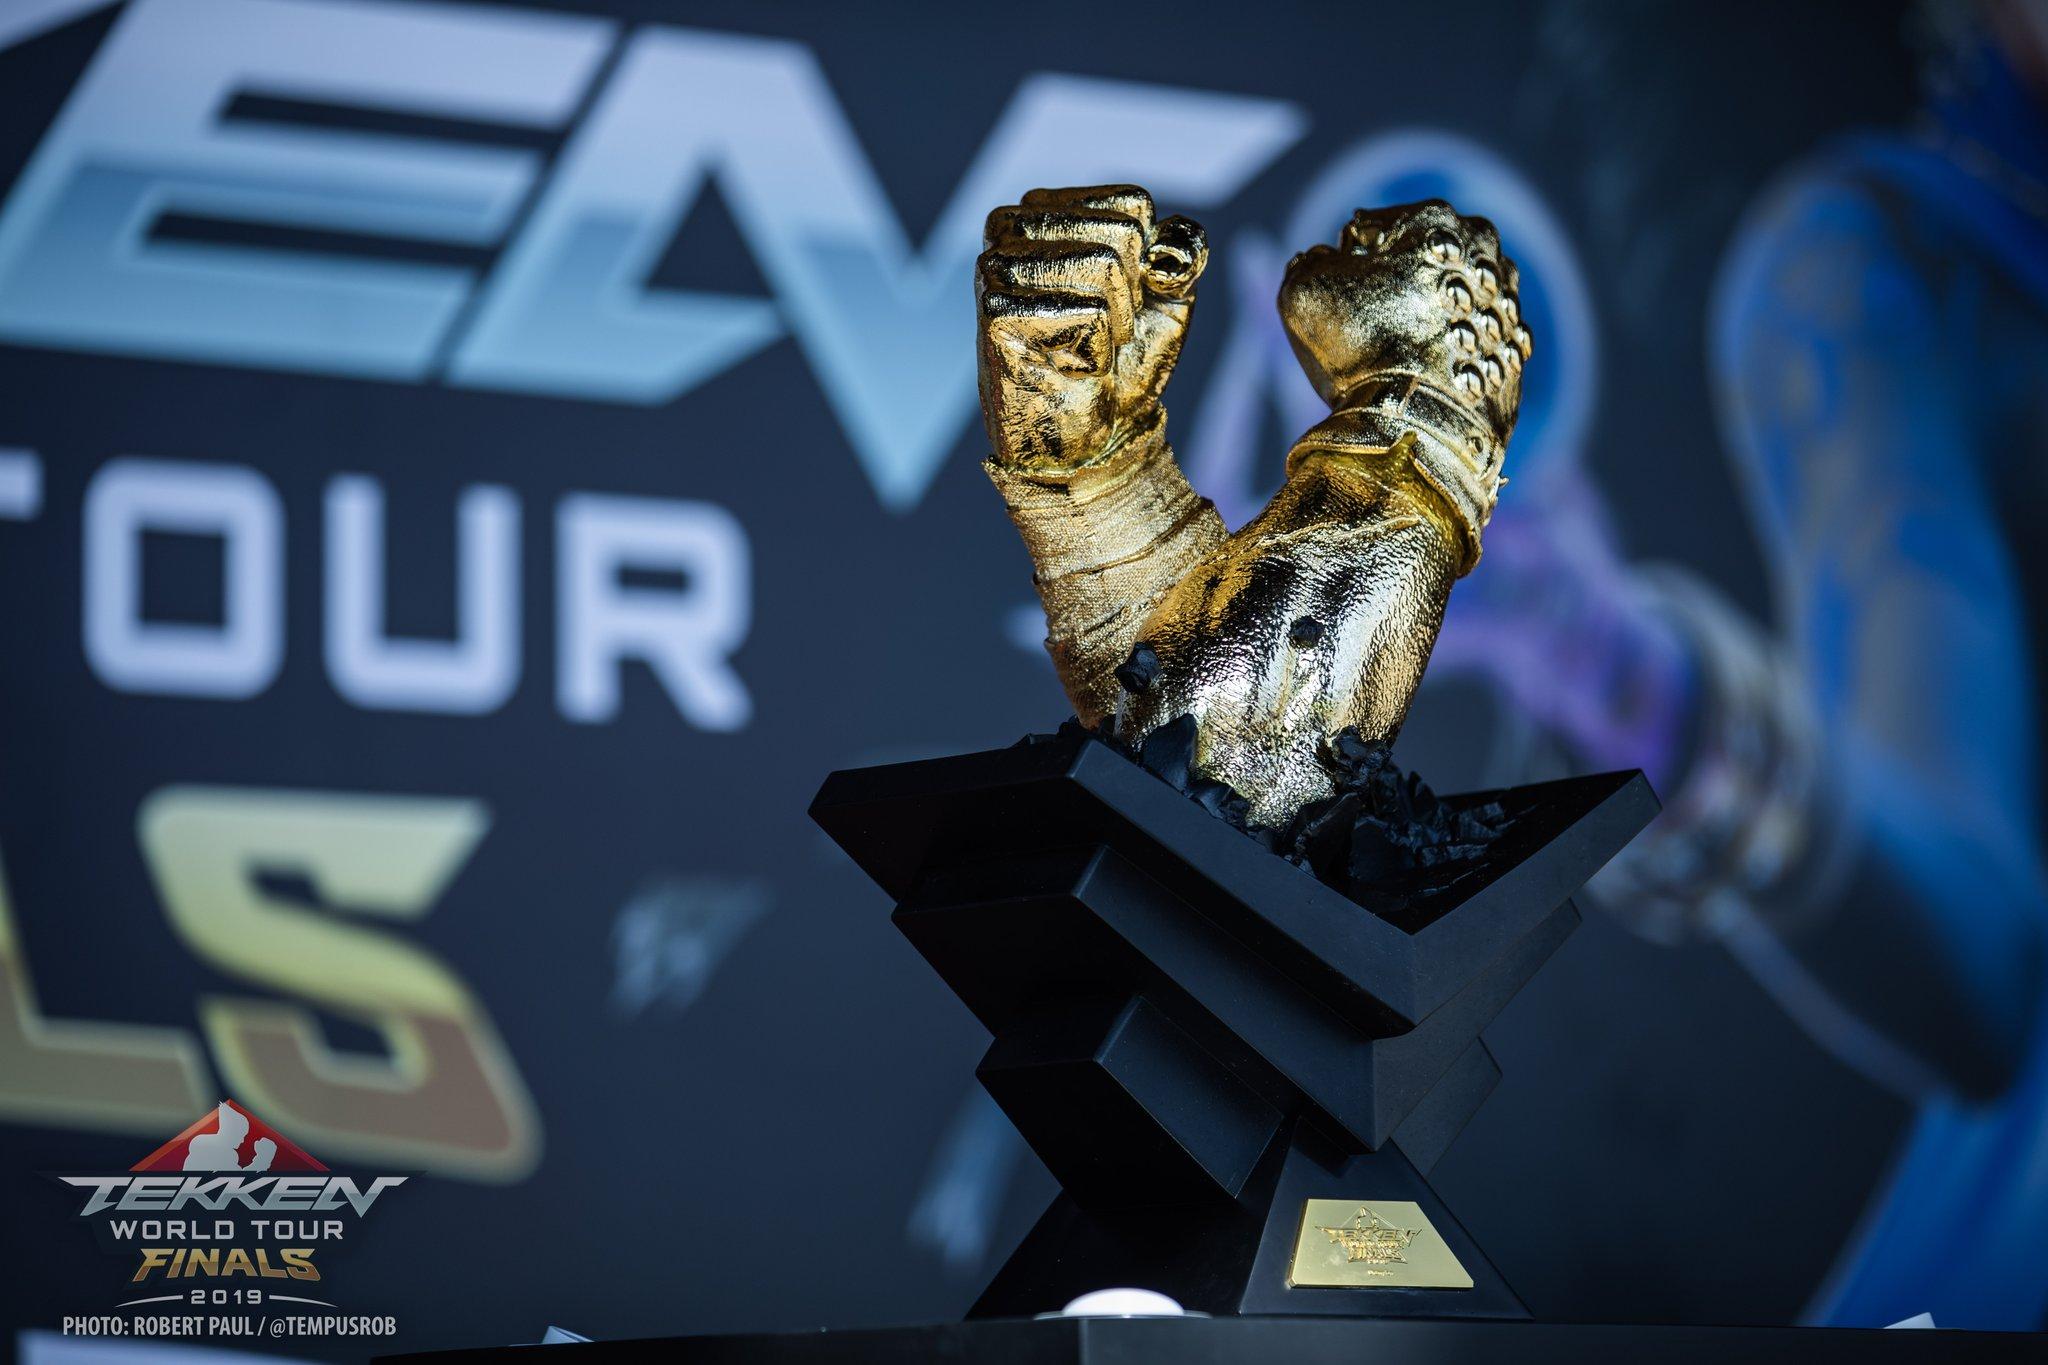 Tekken World Tour 2019 Finals Trophy Devil Jin Statue Designed By Pure Arts Limited